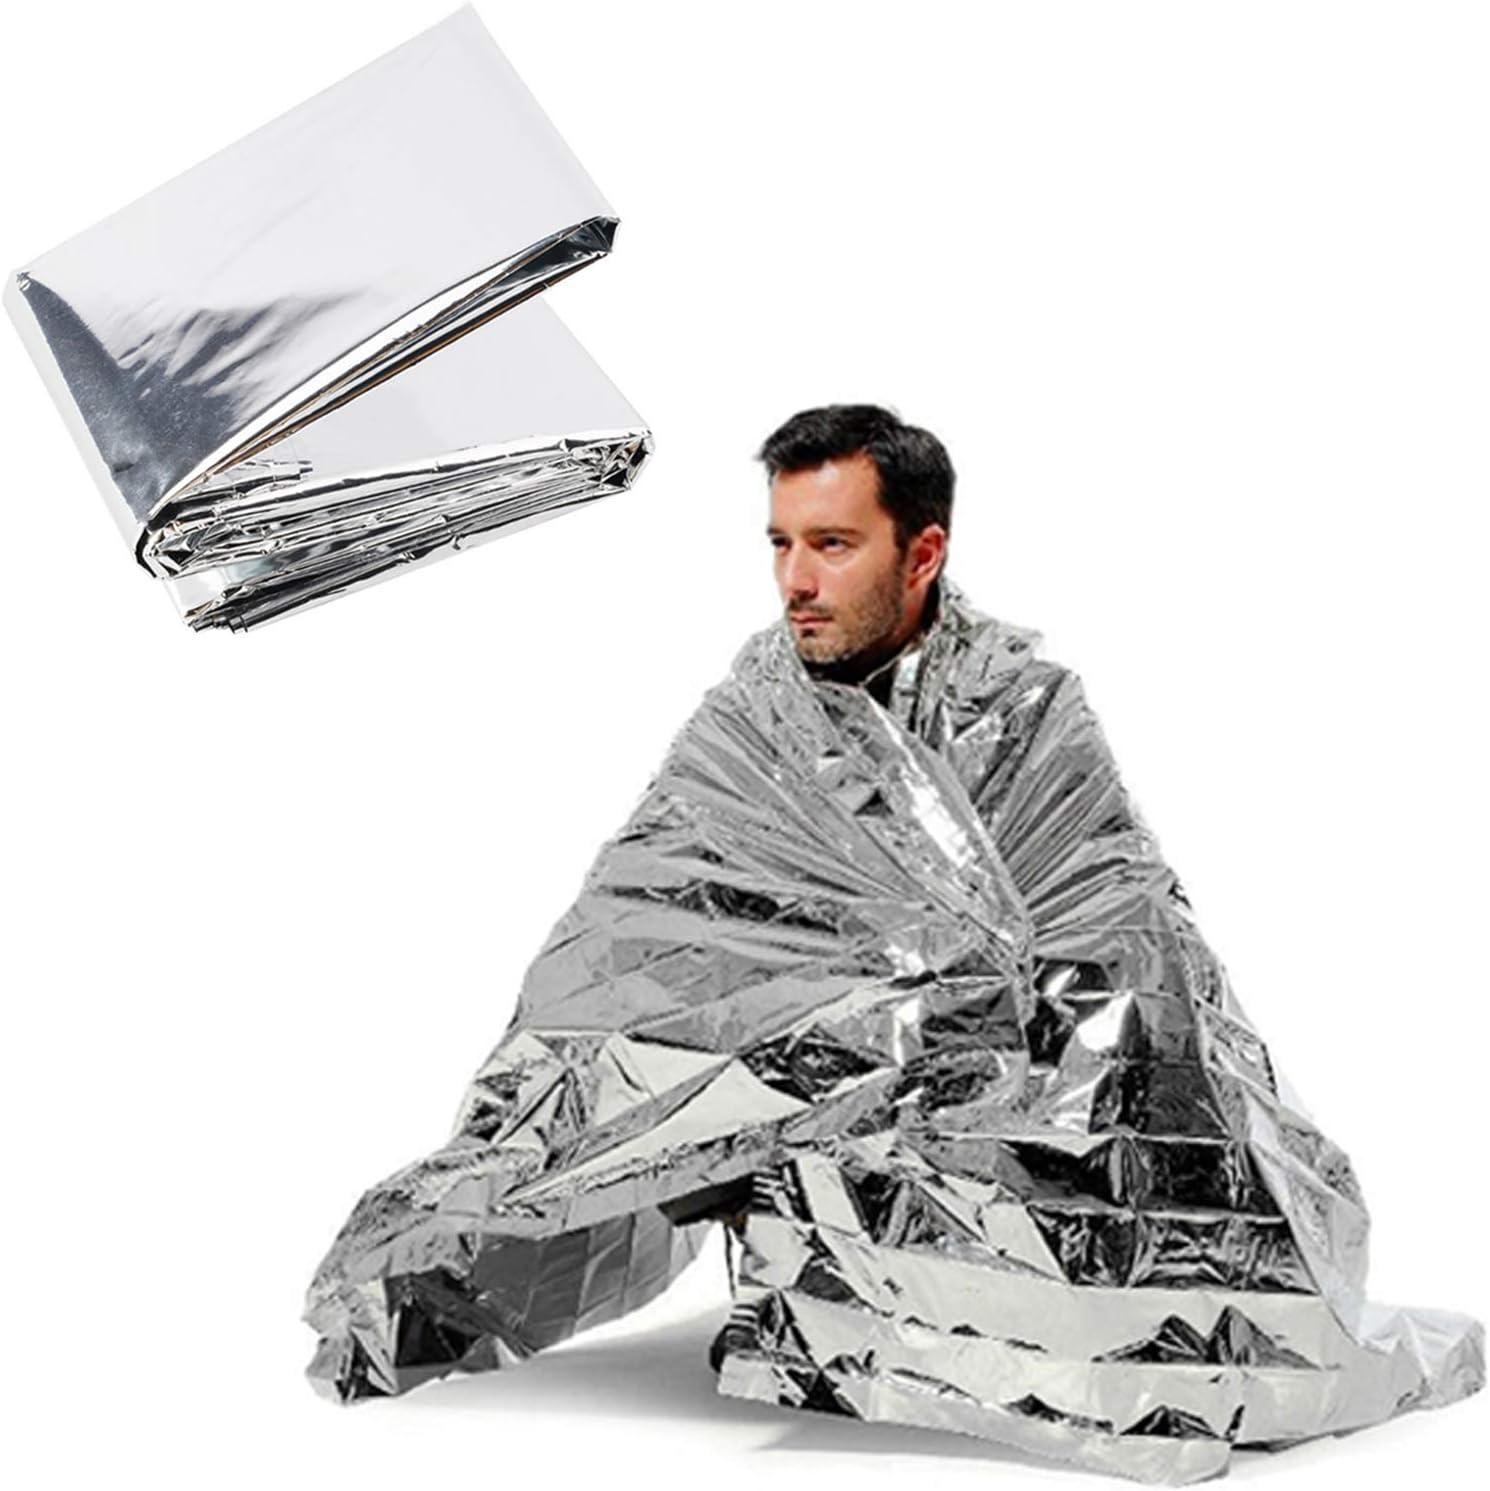 3 Pcs Emergency Blanket Thermal Mylar Space Blanket Silver Foil Blanket Survival